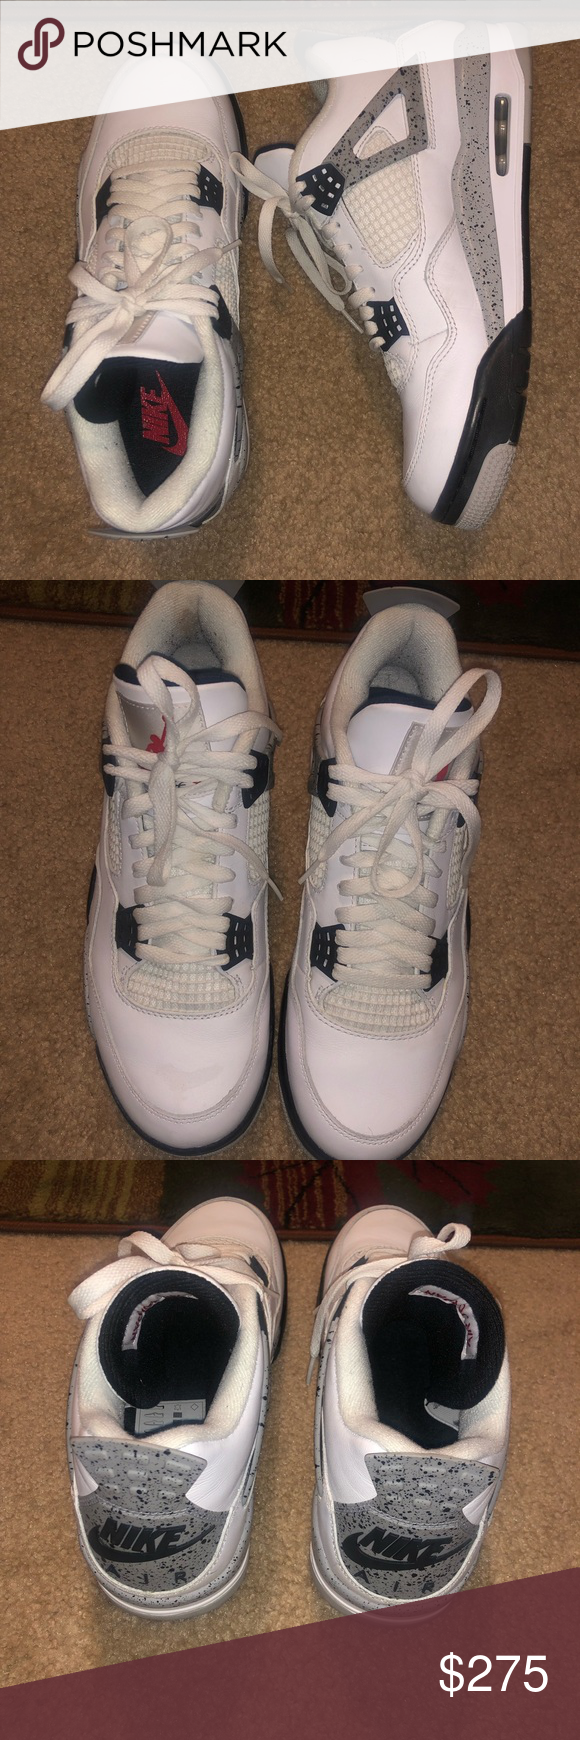 b58ad689 Jordan retro 4 white cement 2016 size 9.5 Slight creasing on the back. Worn  4